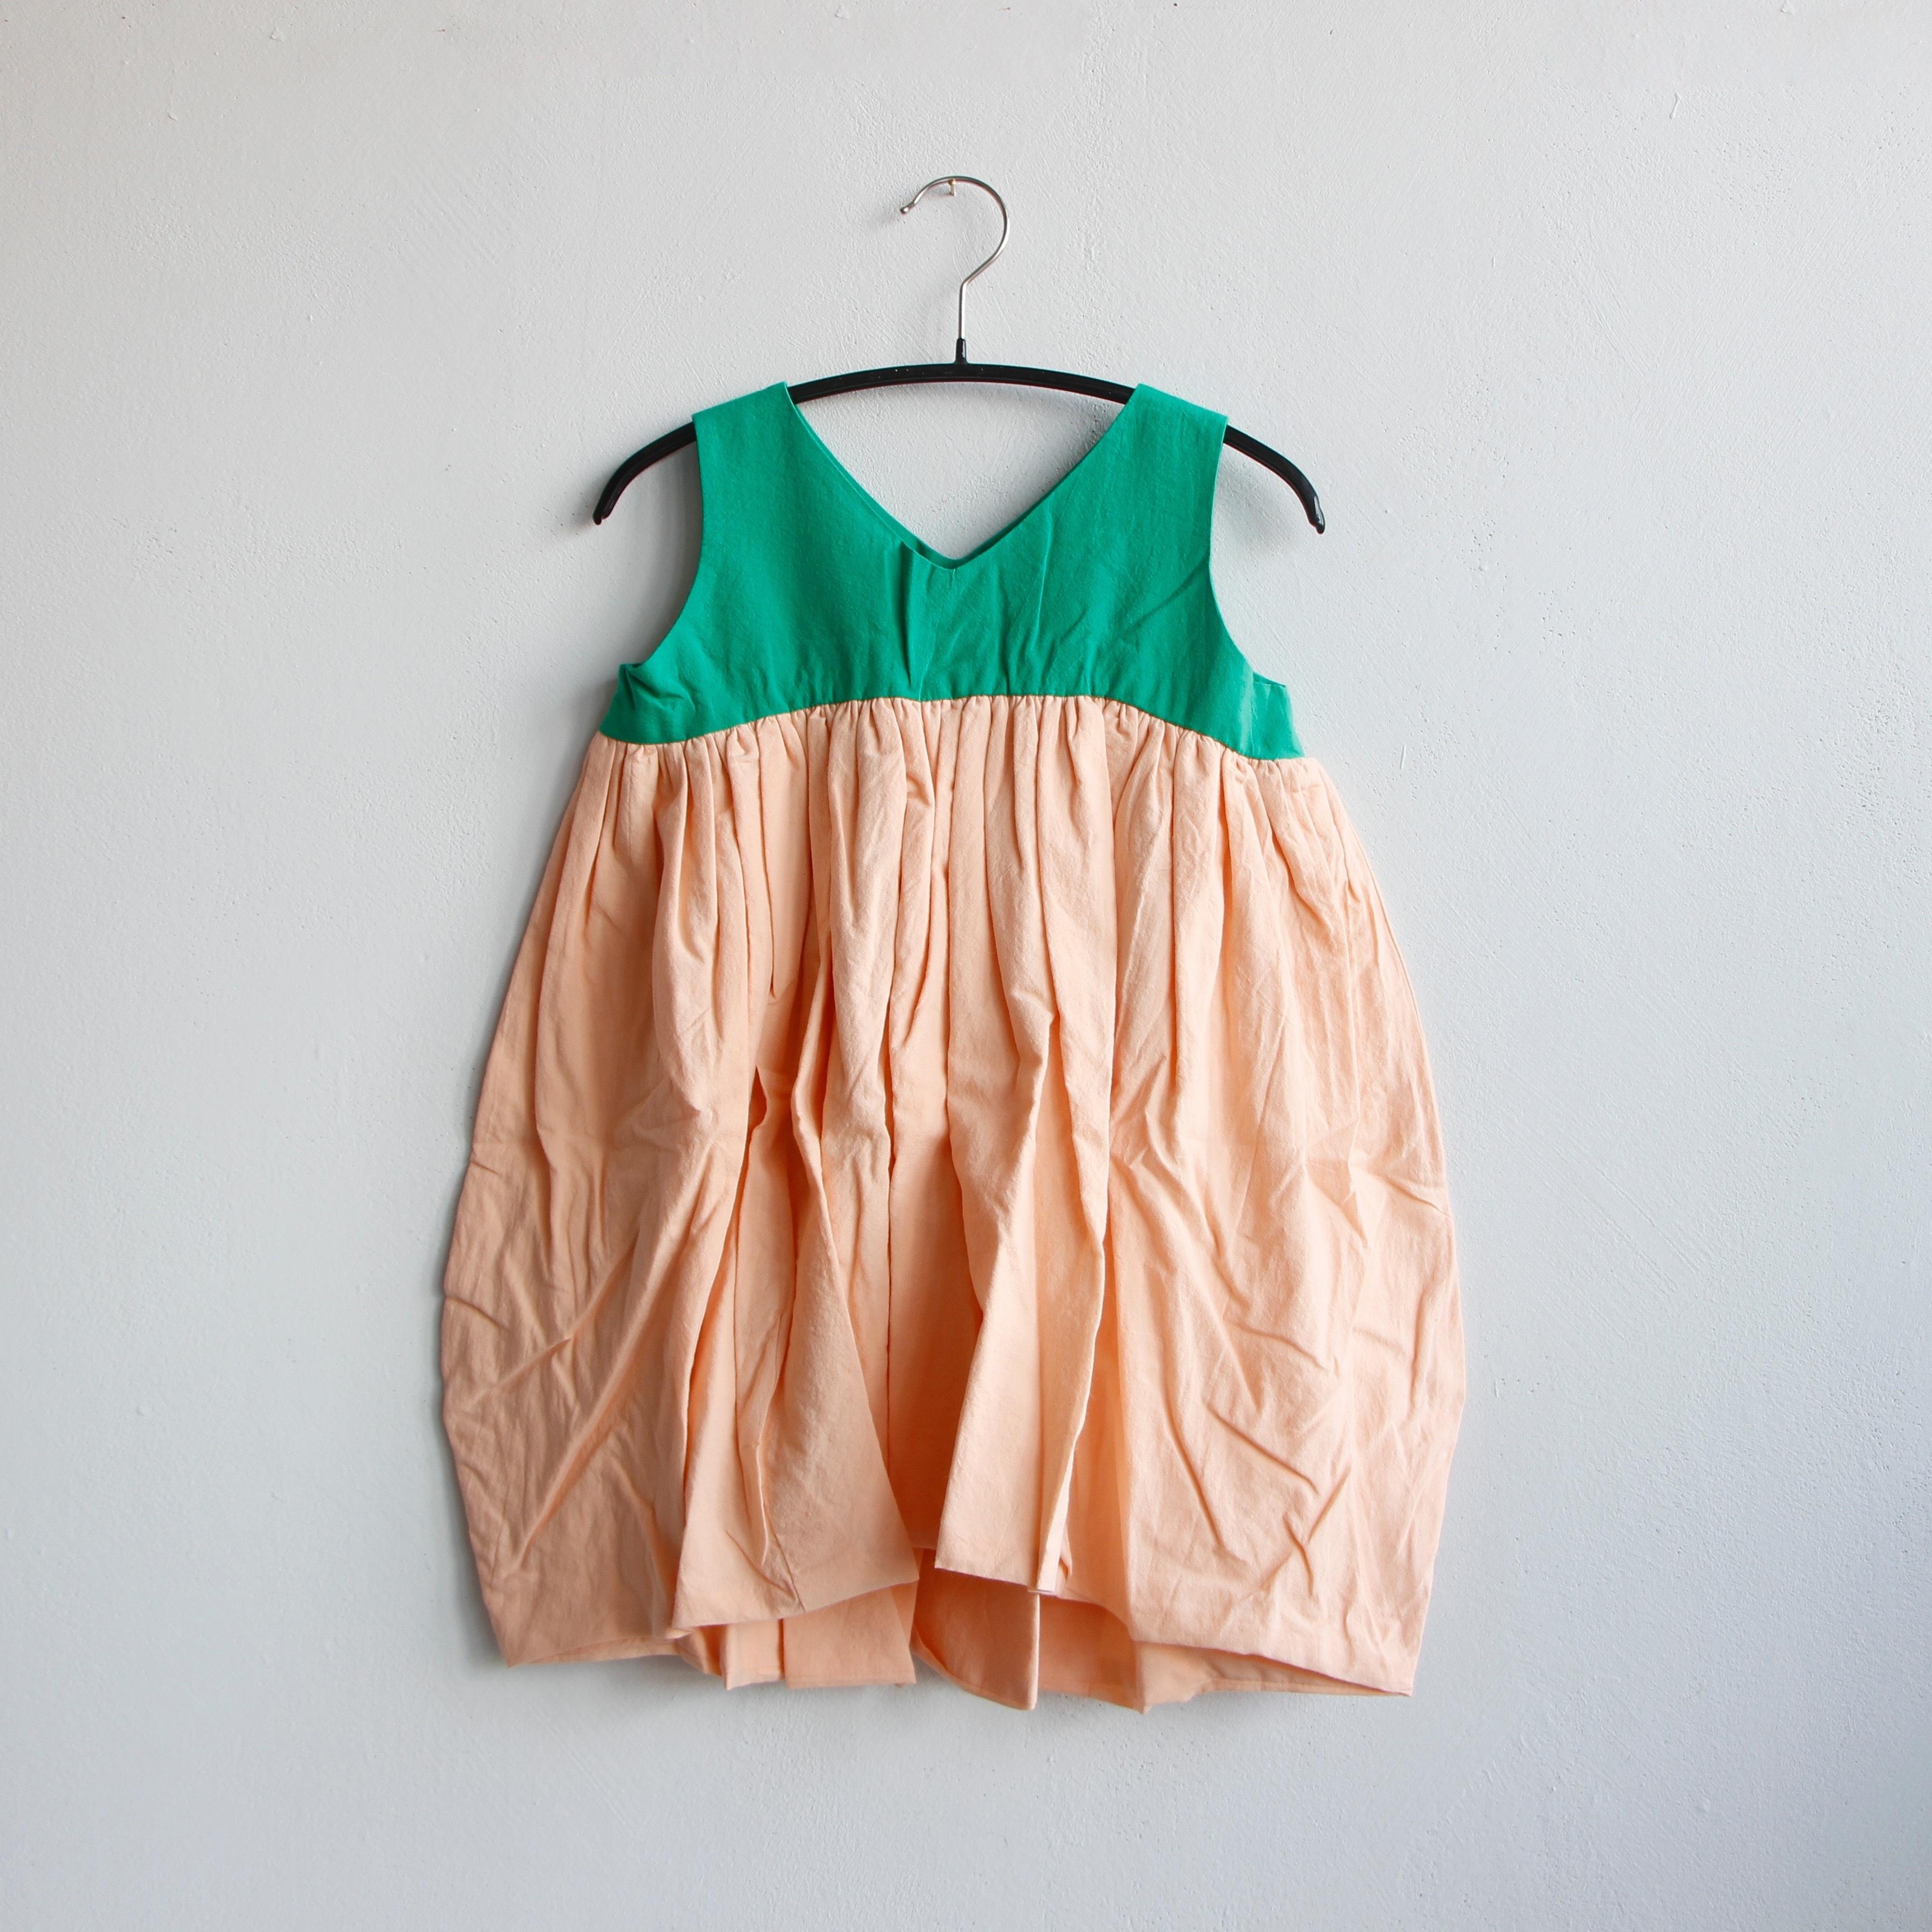 《frankygrow 2020SS》V-NECK DRESS DYED / green × pink / S・M・L